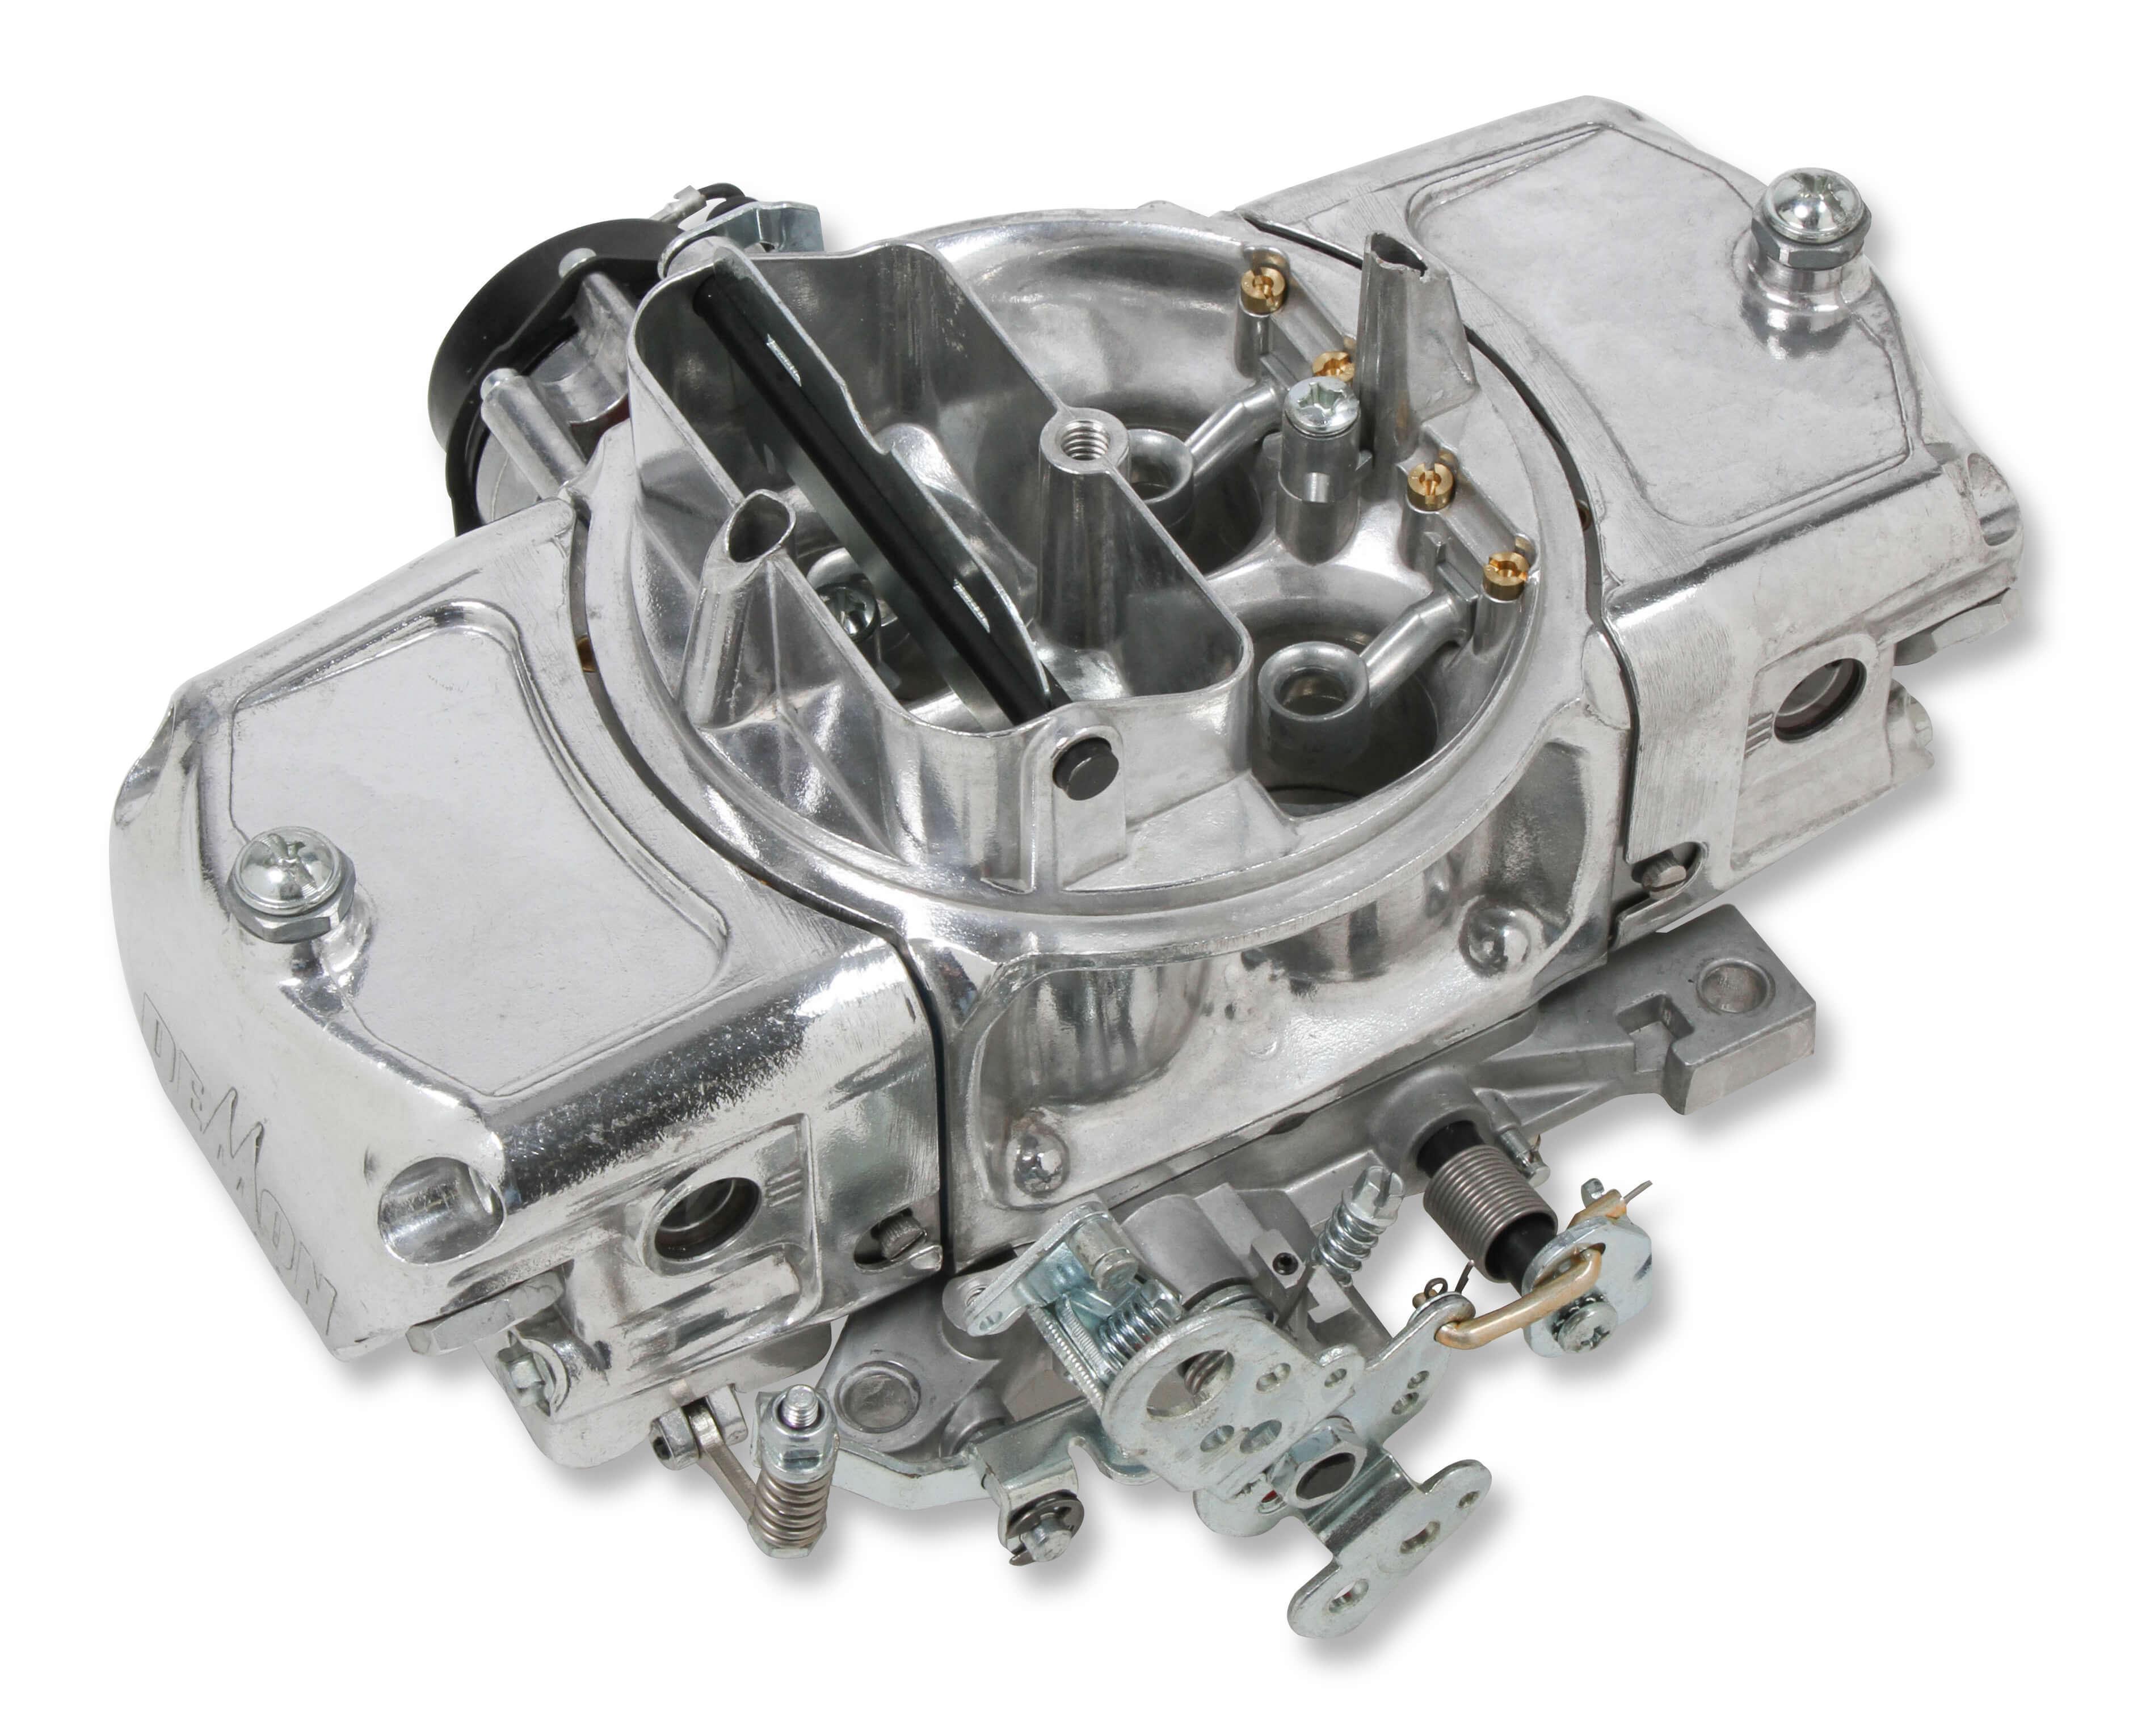 Demon Carburetion RDA-650-MS Carburetor Road Demon 650 CFM